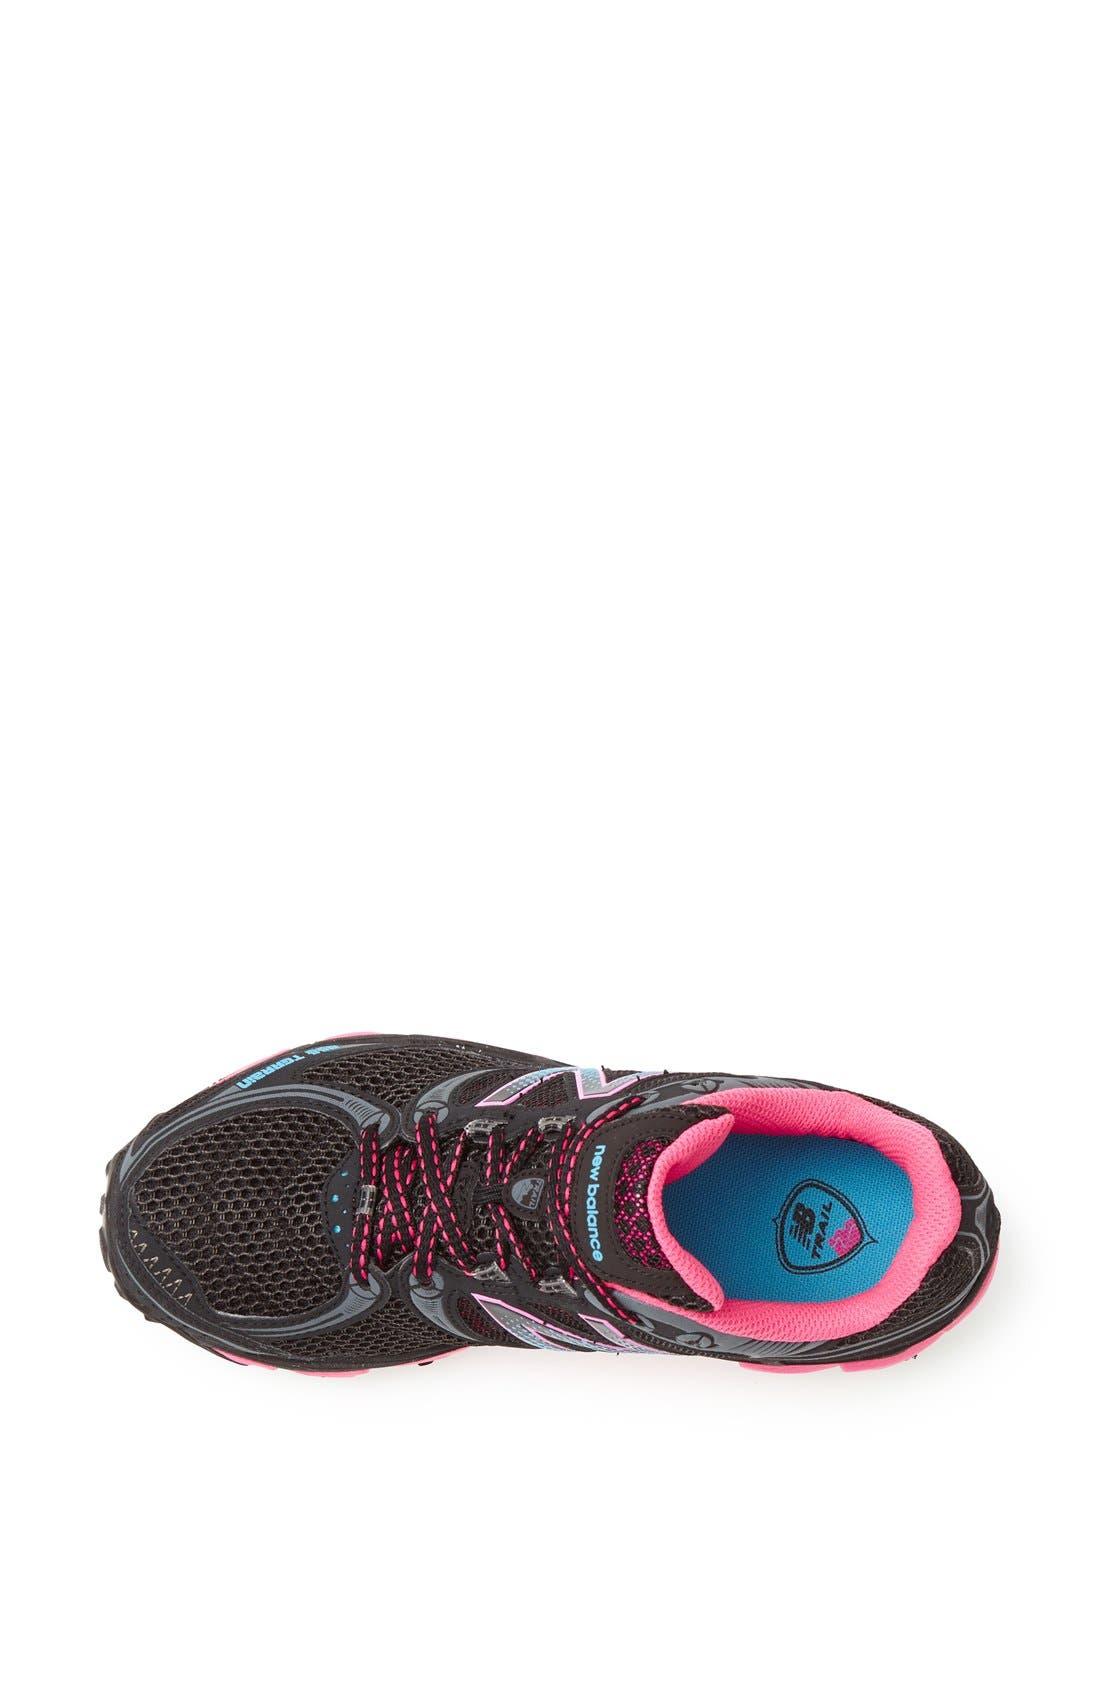 Alternate Image 3  - New Balance '810' Trail Running Shoe